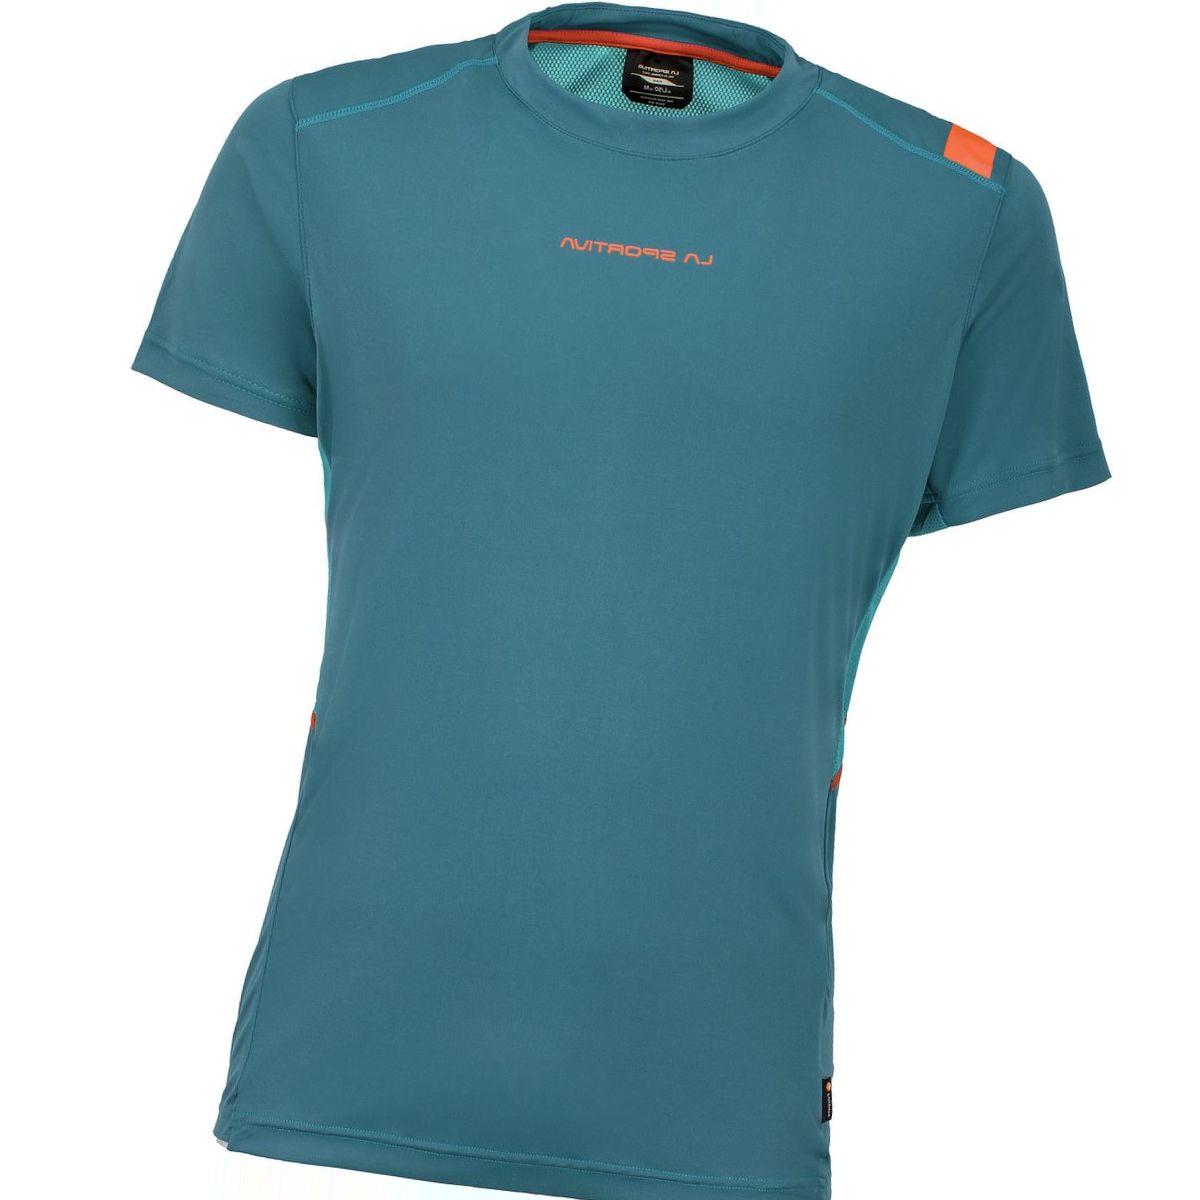 La Sportiva Blitz Short-Sleeve T-Shirt - Men's